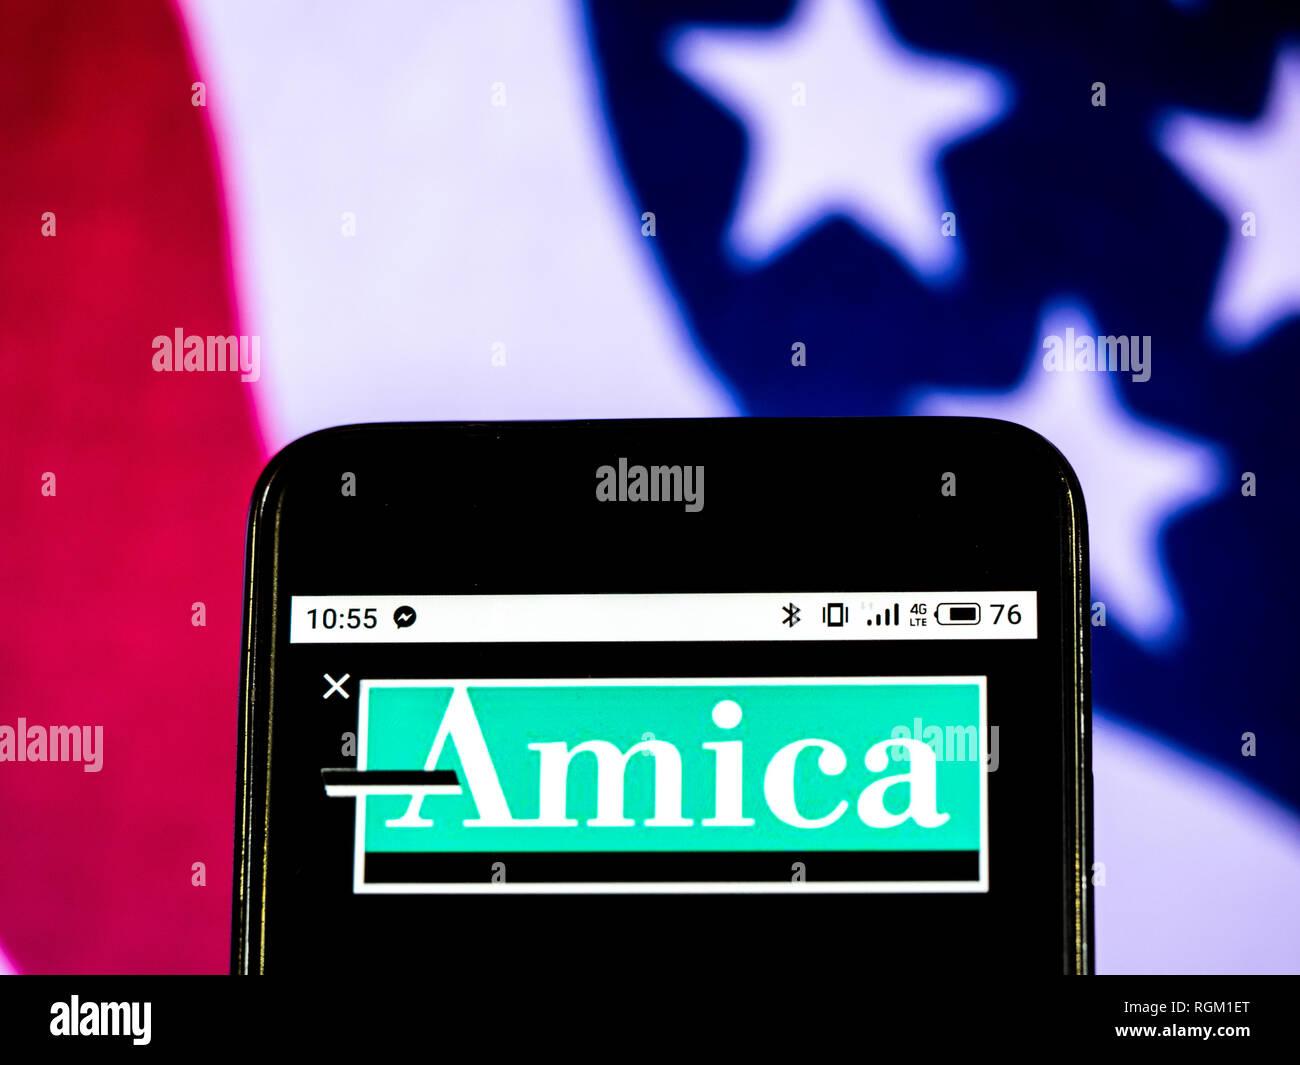 Amica Insurance Company >> Amica Mutual Insurance Company Logo Seen Displayed On Smart